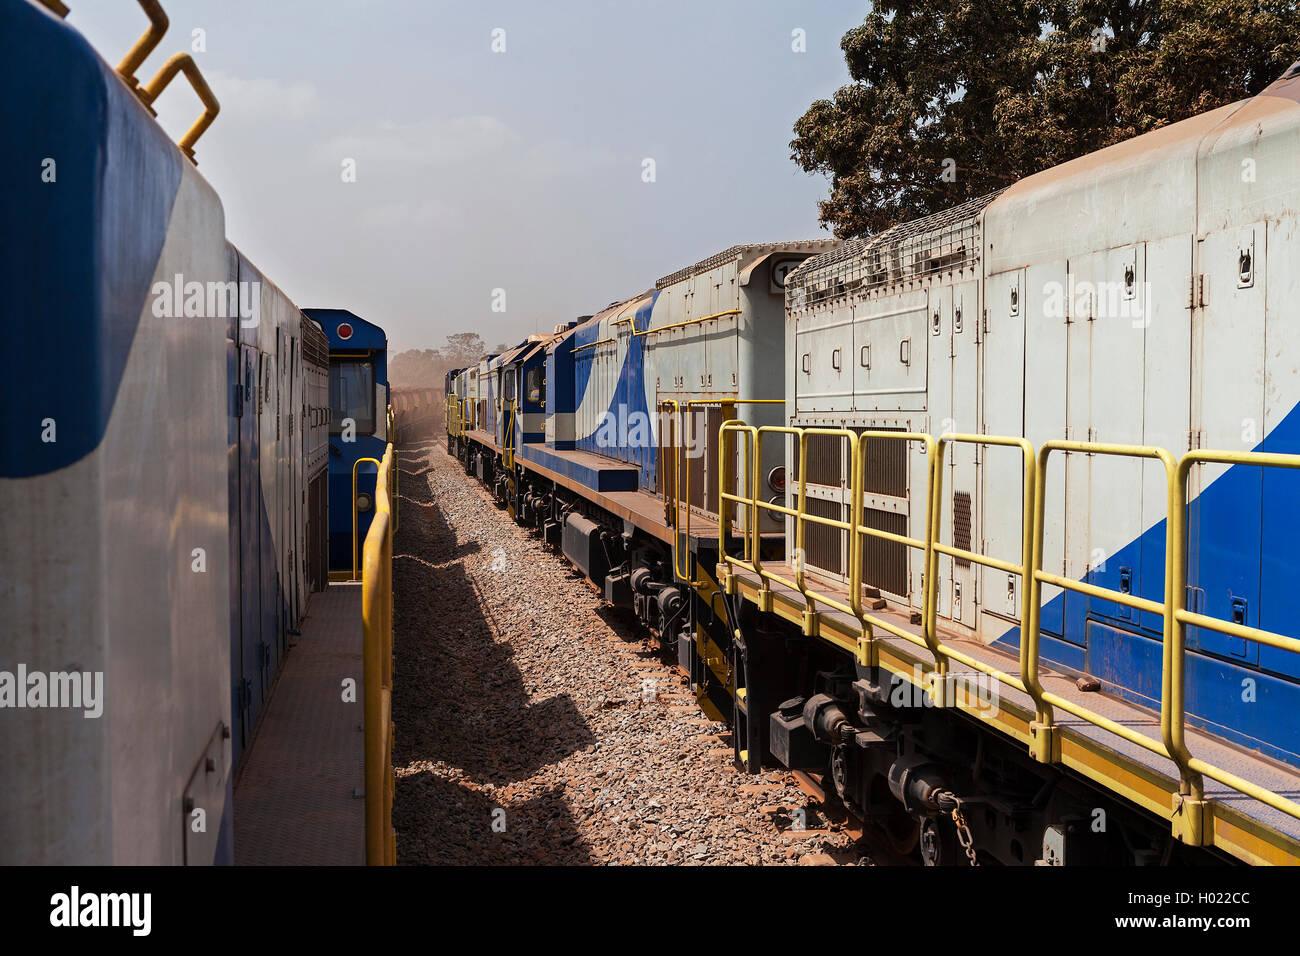 Locomotives Grindrod Photos & Locomotives Grindrod Images - Alamy